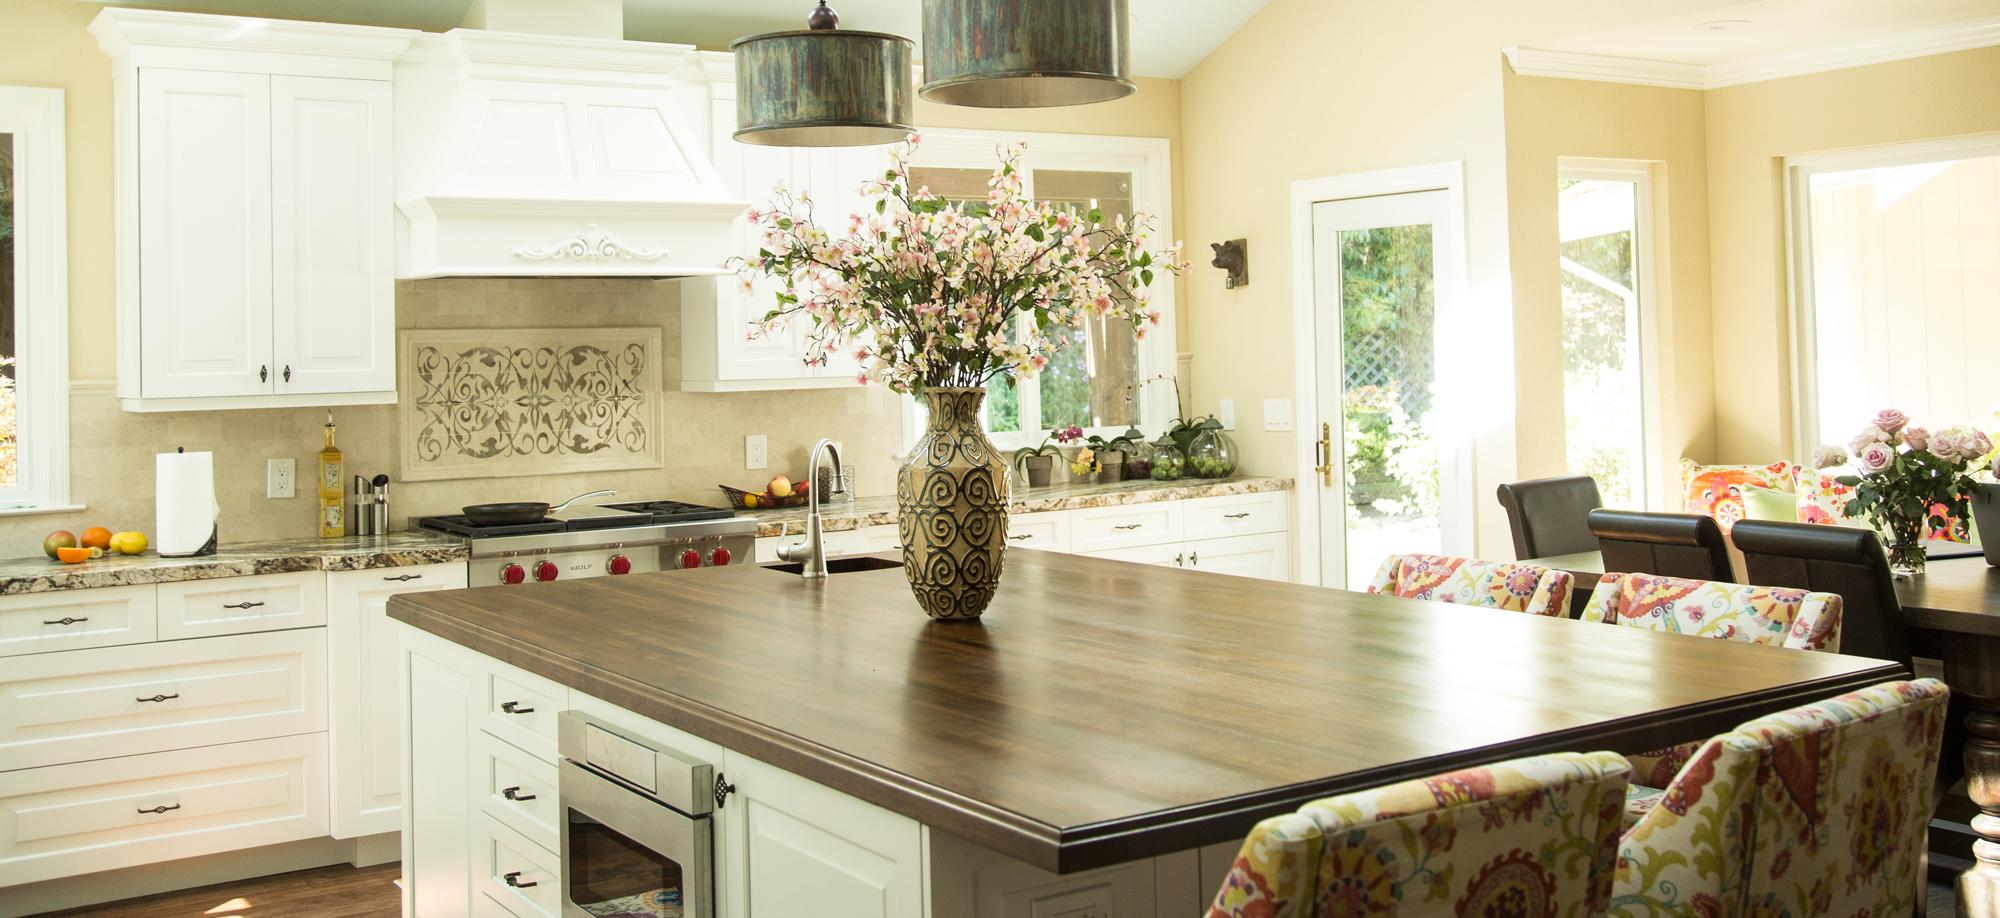 walnut butcher block countertop with everlast varnish